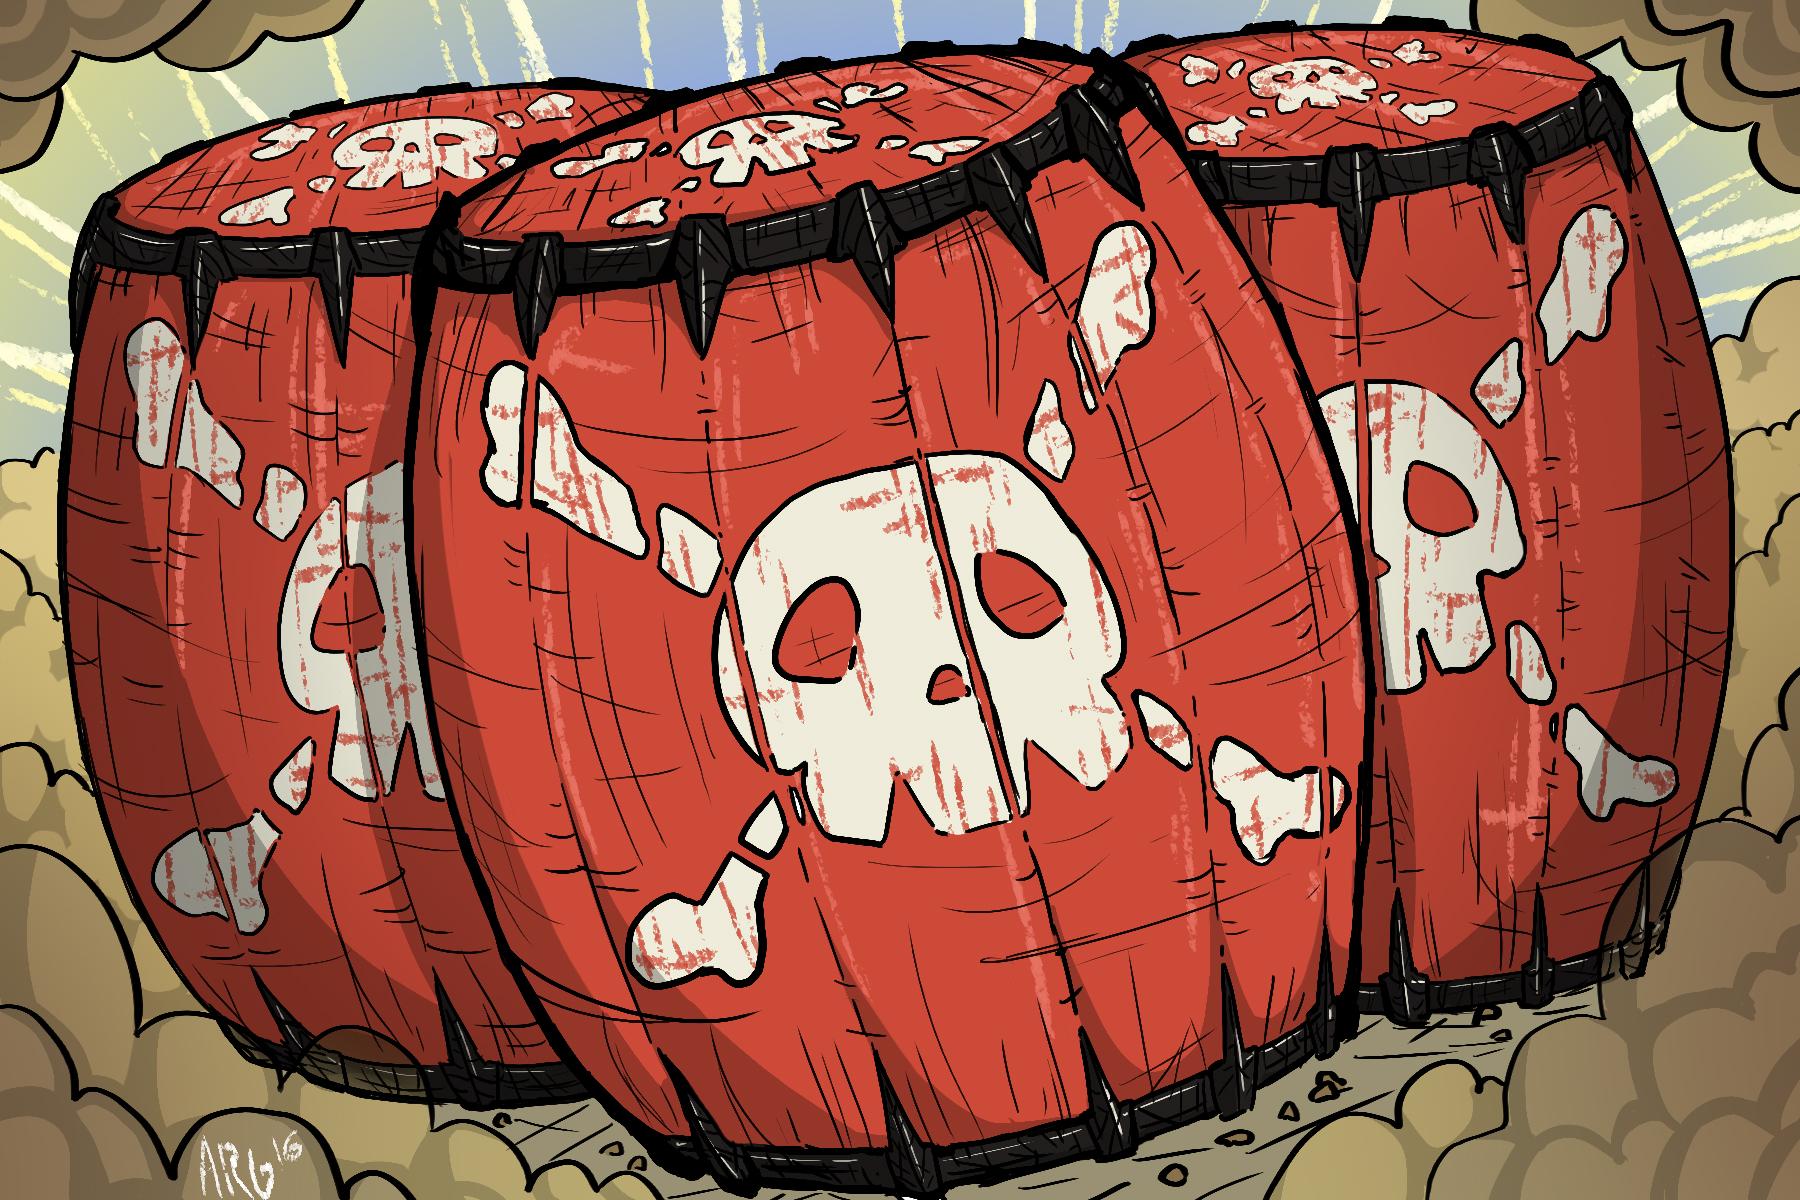 Barrel Bombs - Breath of the Wild